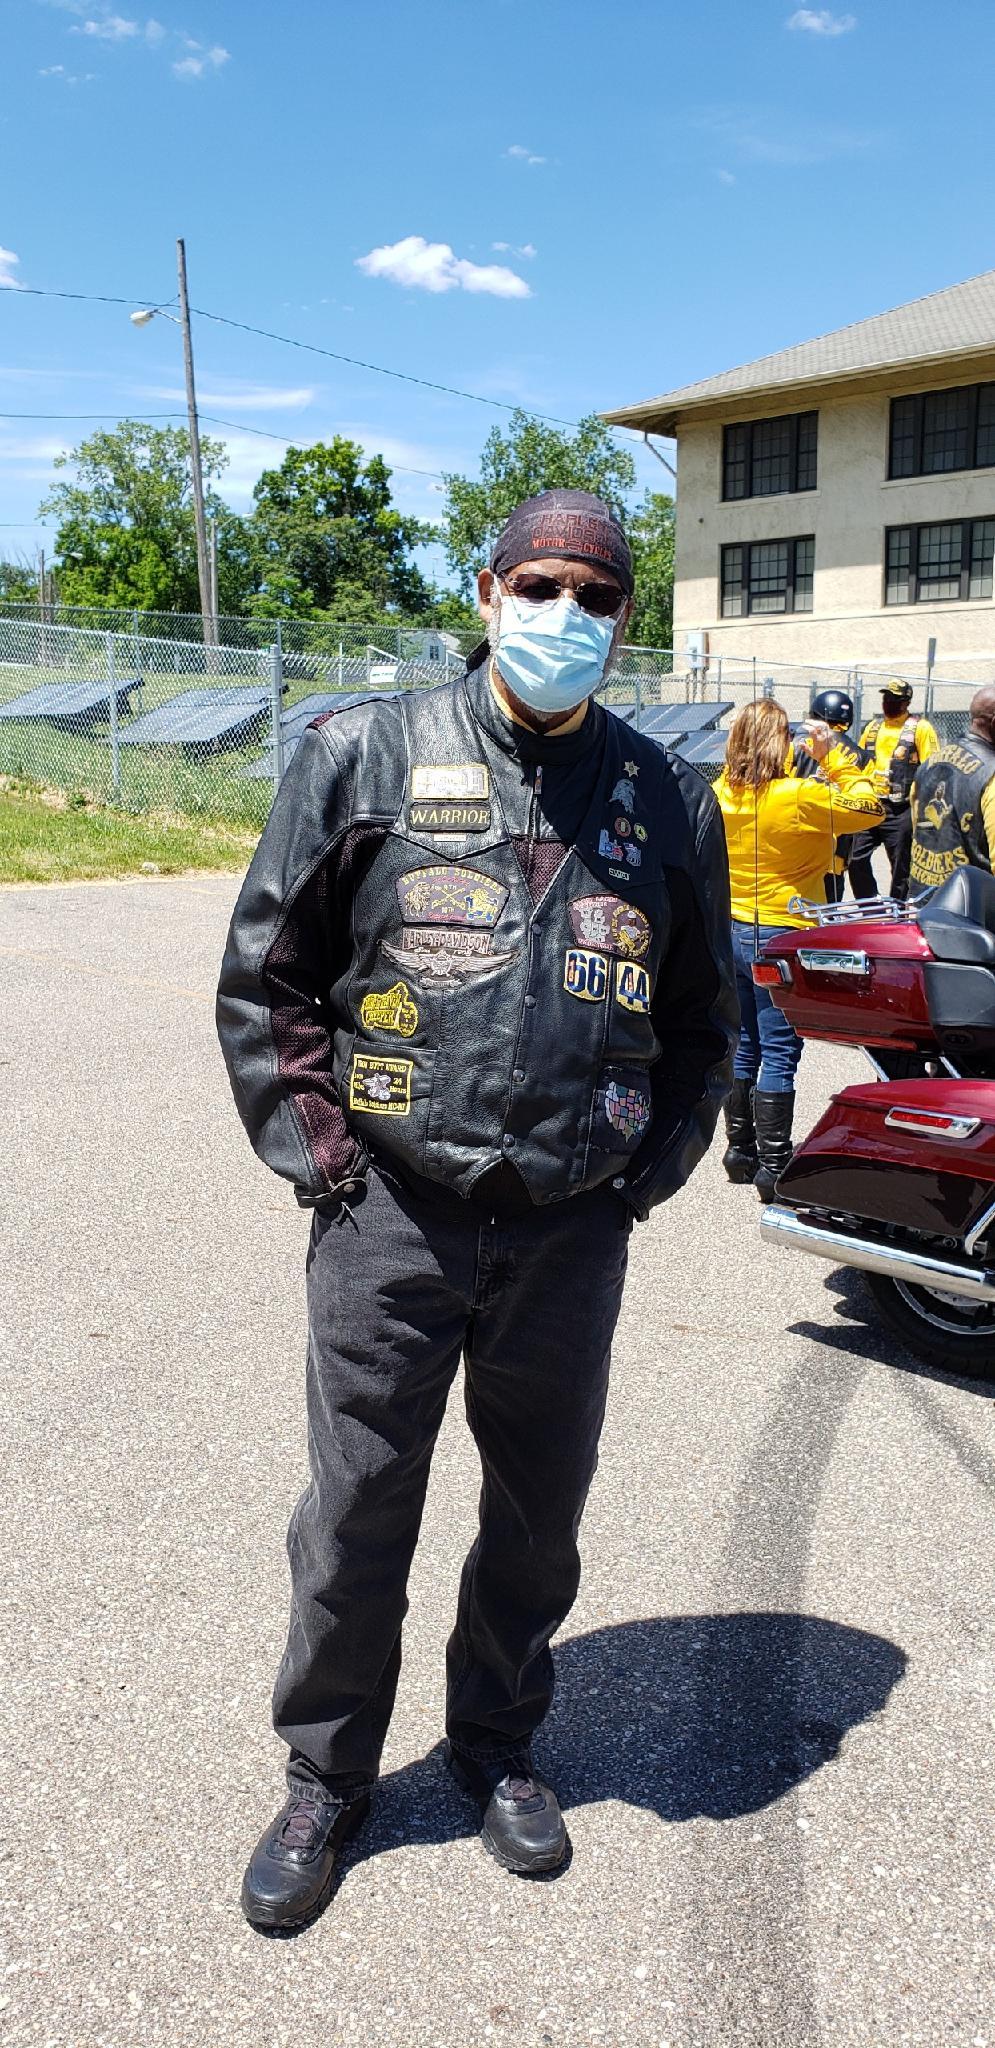 Warrior - Michigan Chapter - 001